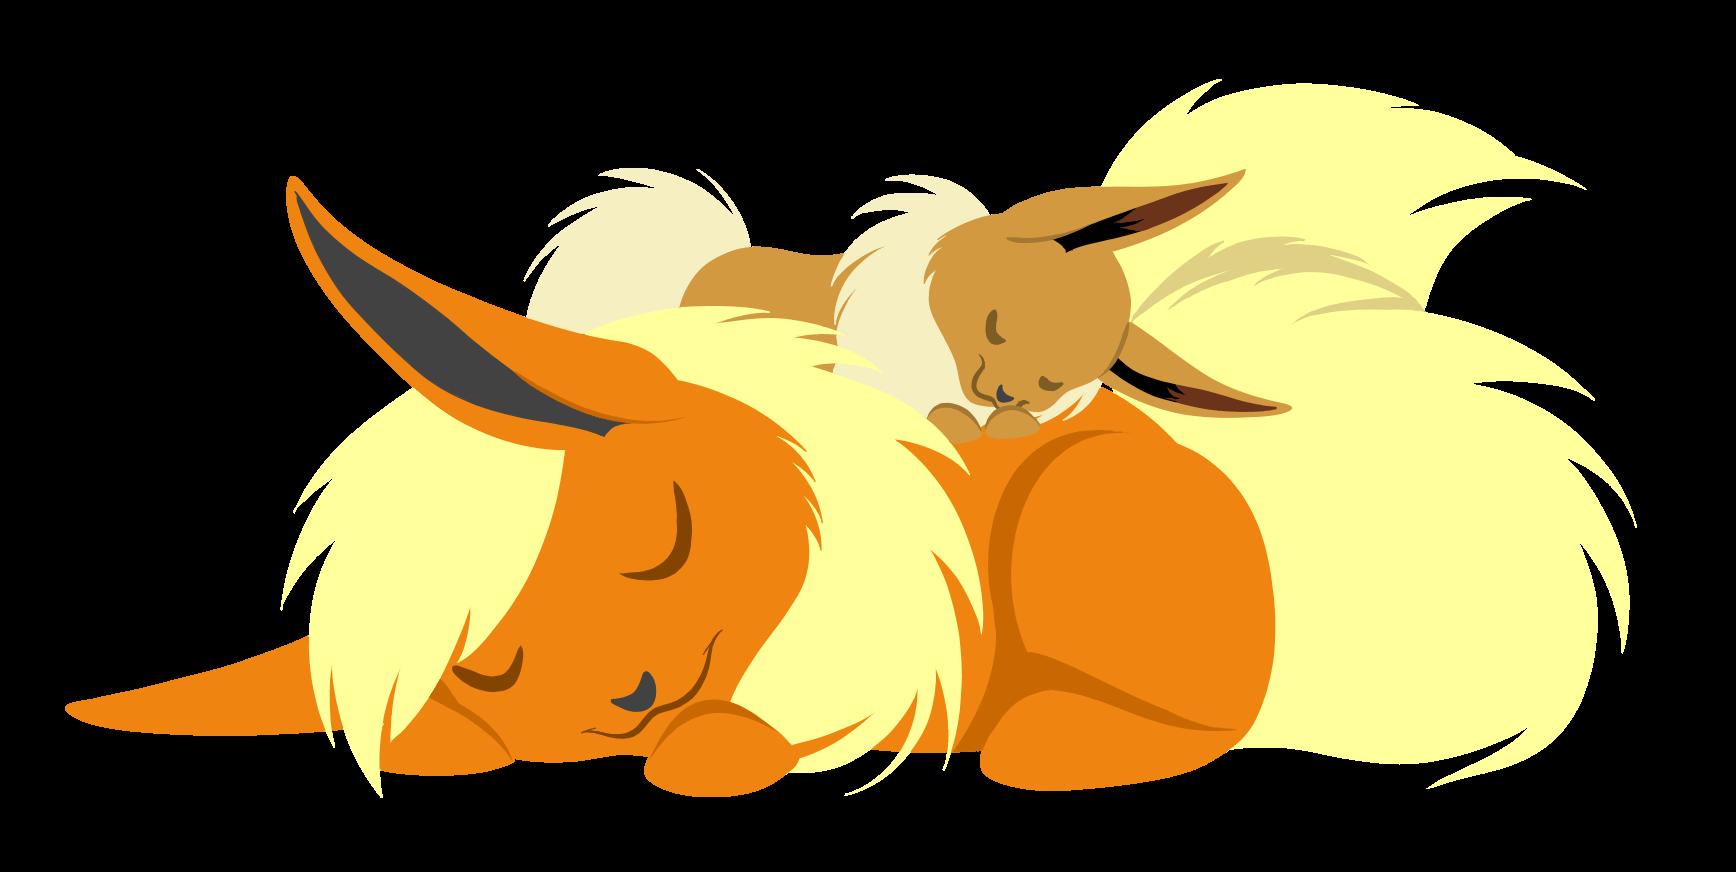 e621 ascar_angainor canine cute duo eevee eeveelution eyes_closed female feral flareon fox hi_res mammal nintendo pokémon simple_background sleeping video_games